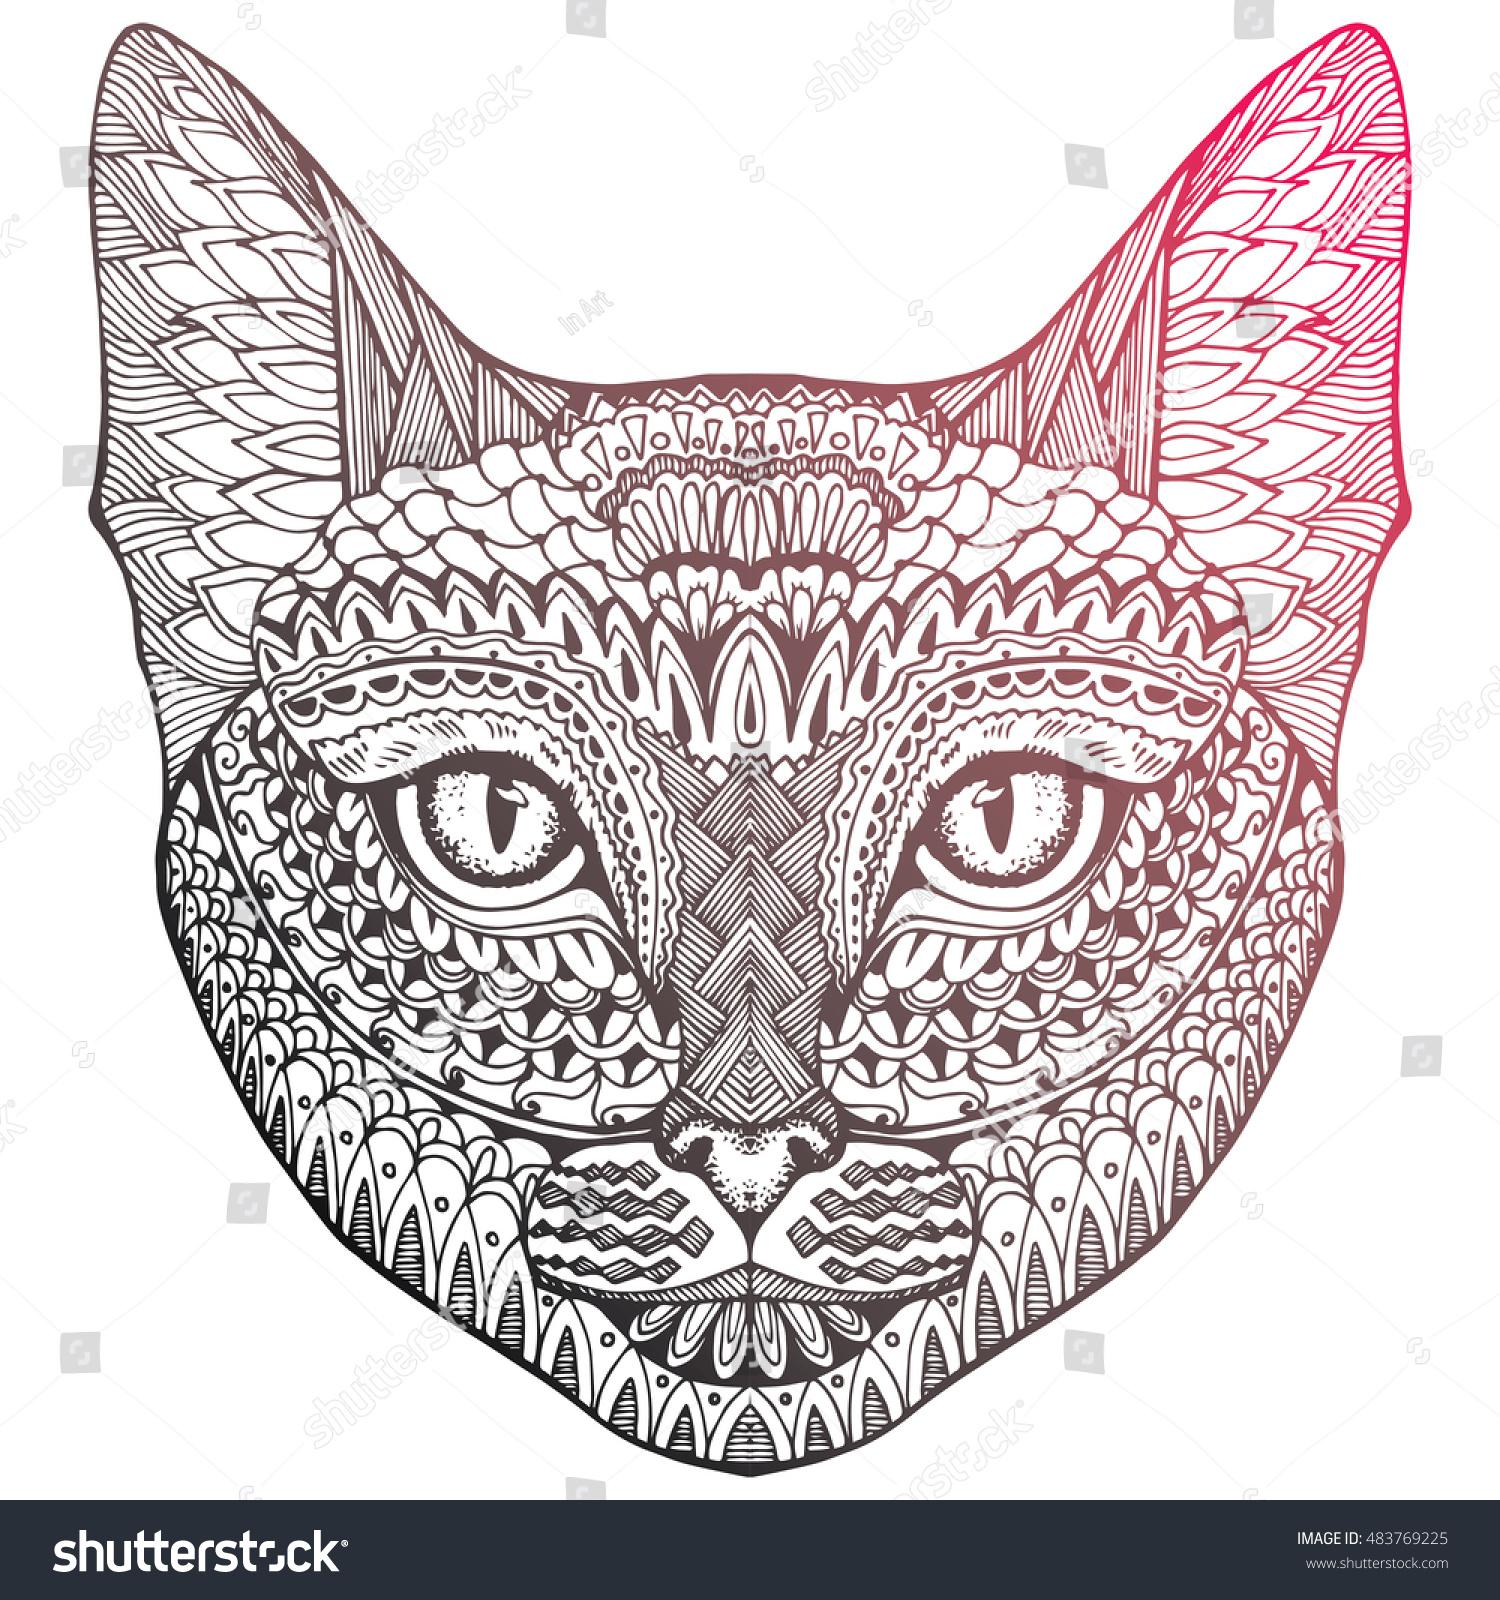 Uncategorized Cat Head Drawing cat portrait cats head cute stock vector 483769225 shutterstock of a animal a